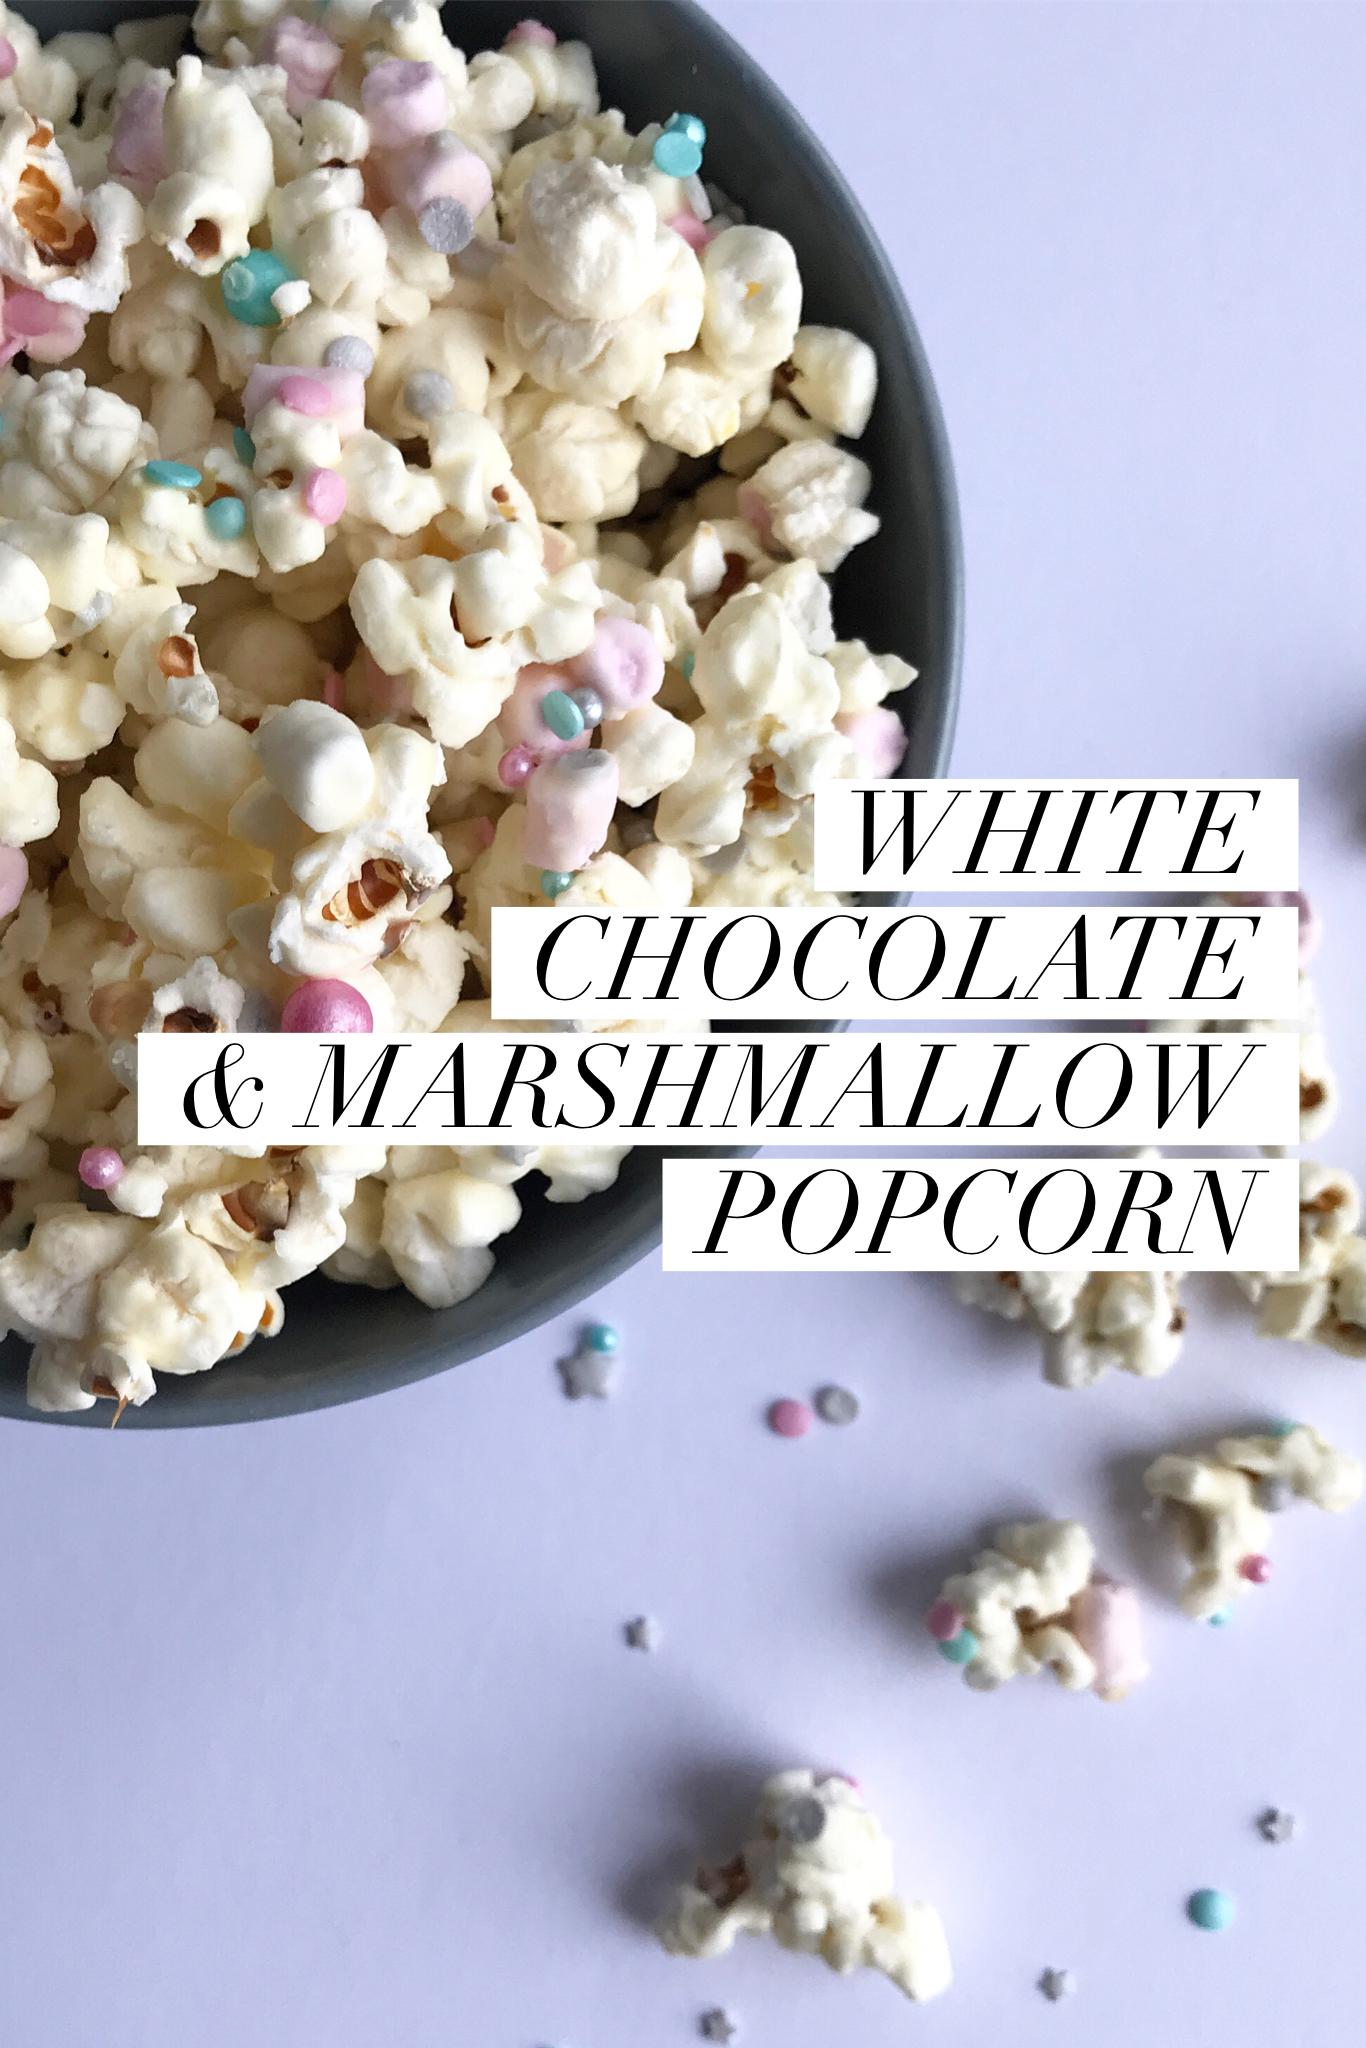 White Chocolate and Marshmallow Popcorn